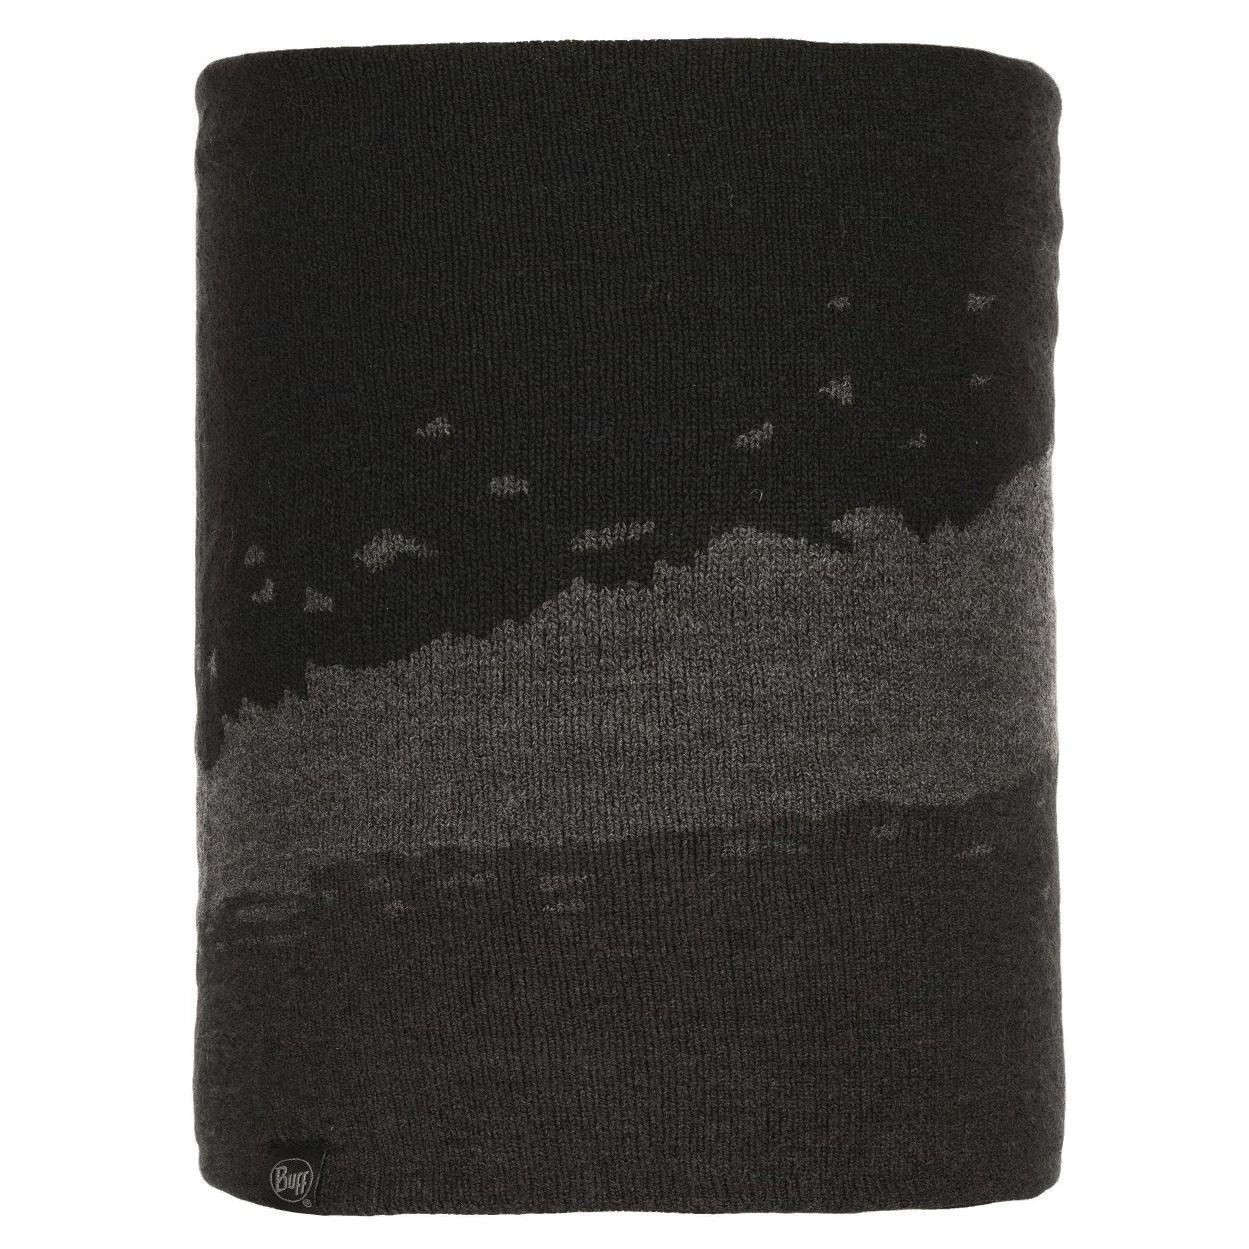 Купить Шарф BUFF KNITTED NECKWARMER TOVE BLACK, Банданы и шарфы Buff ®, 1377366